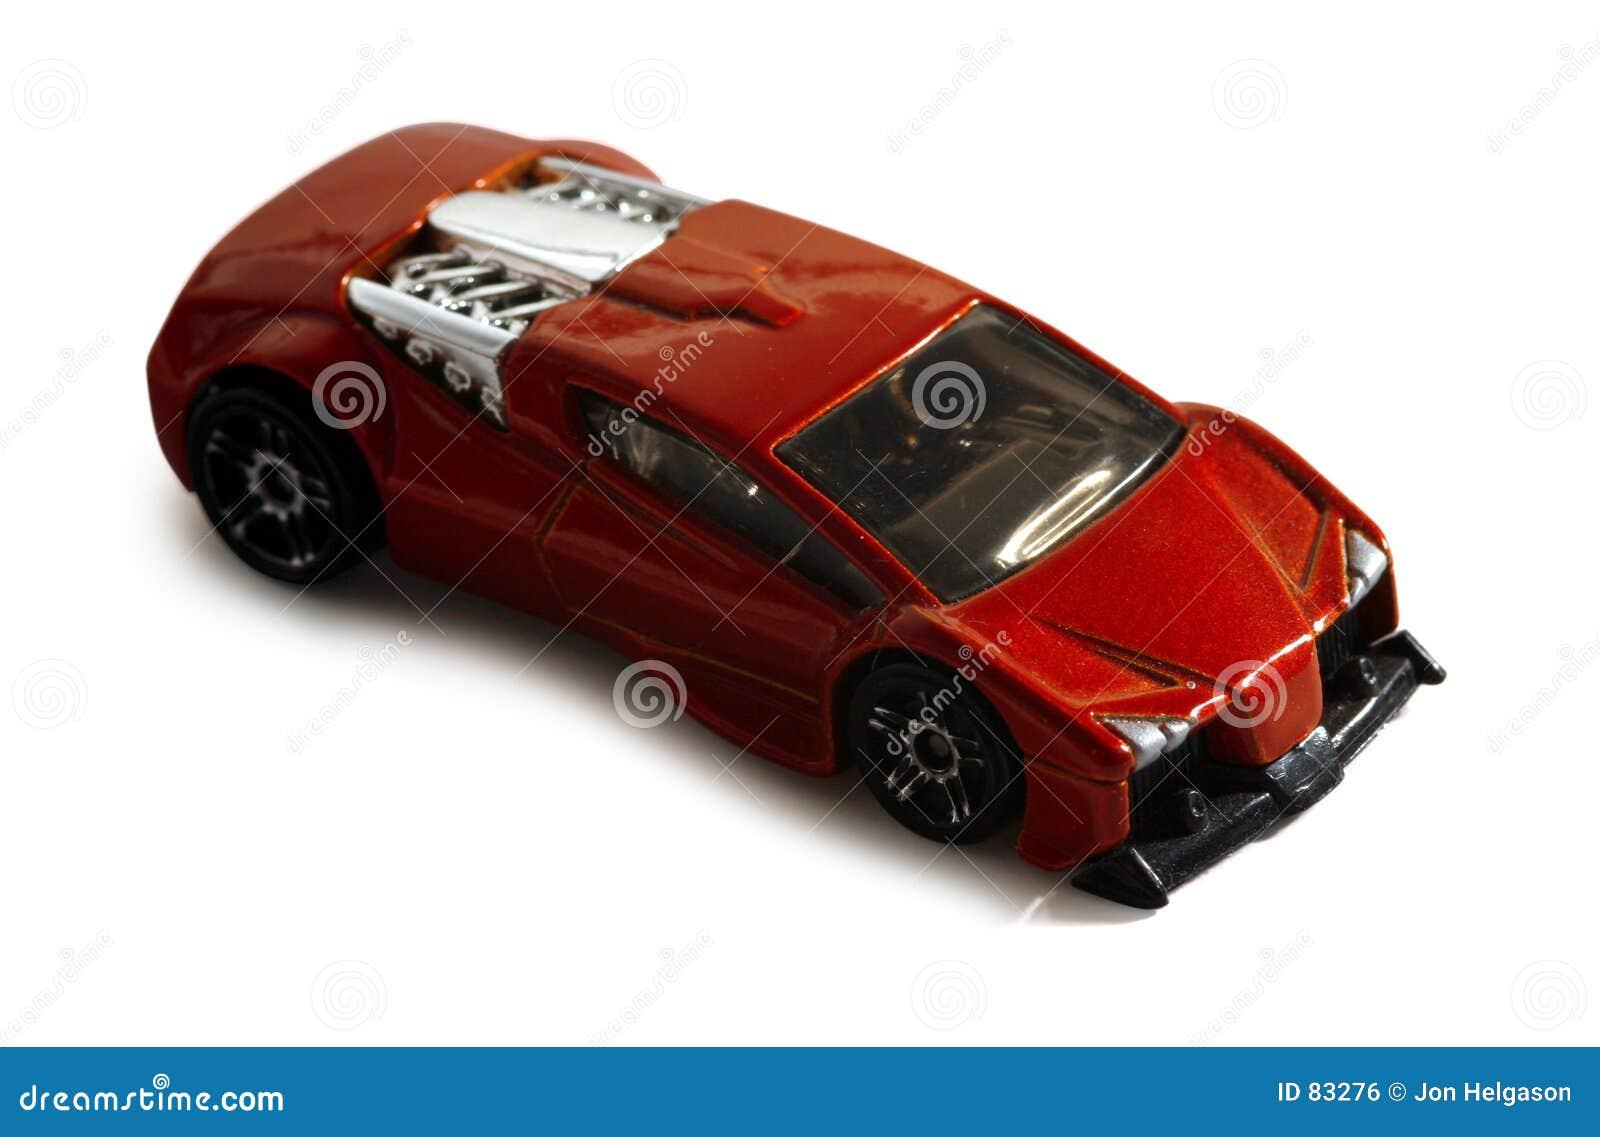 Car miniature toy